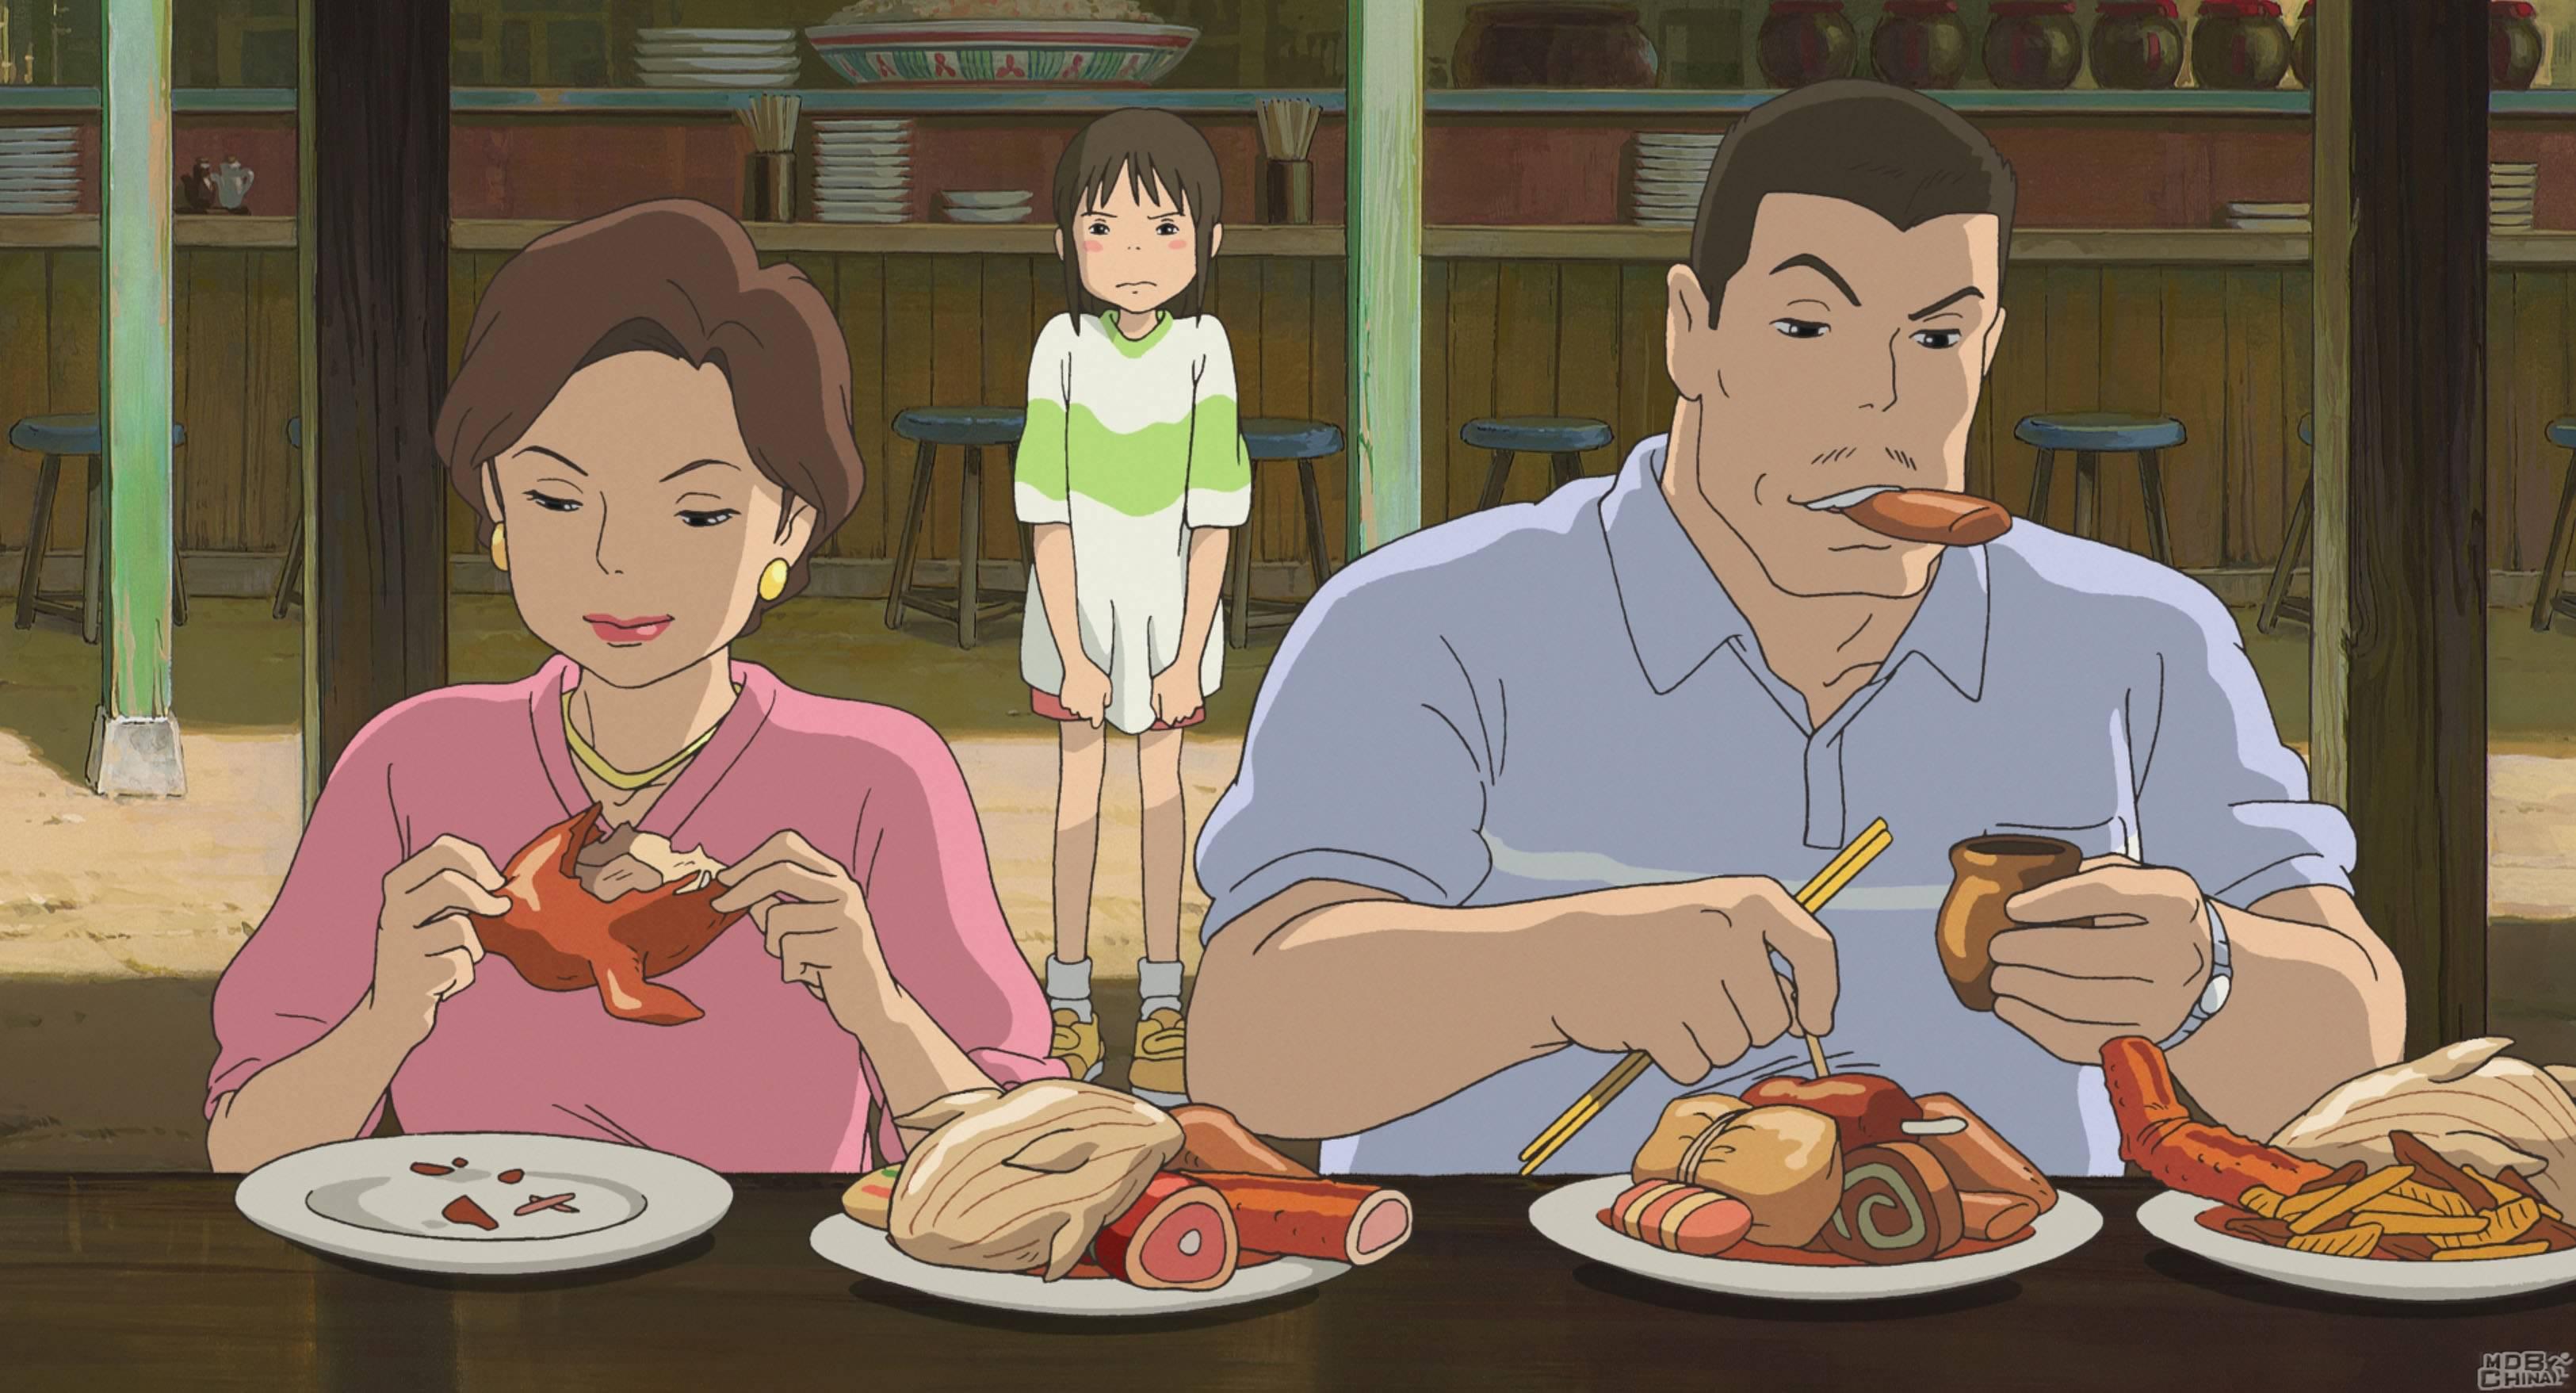 Chihiro's parents eat like pig.jpg